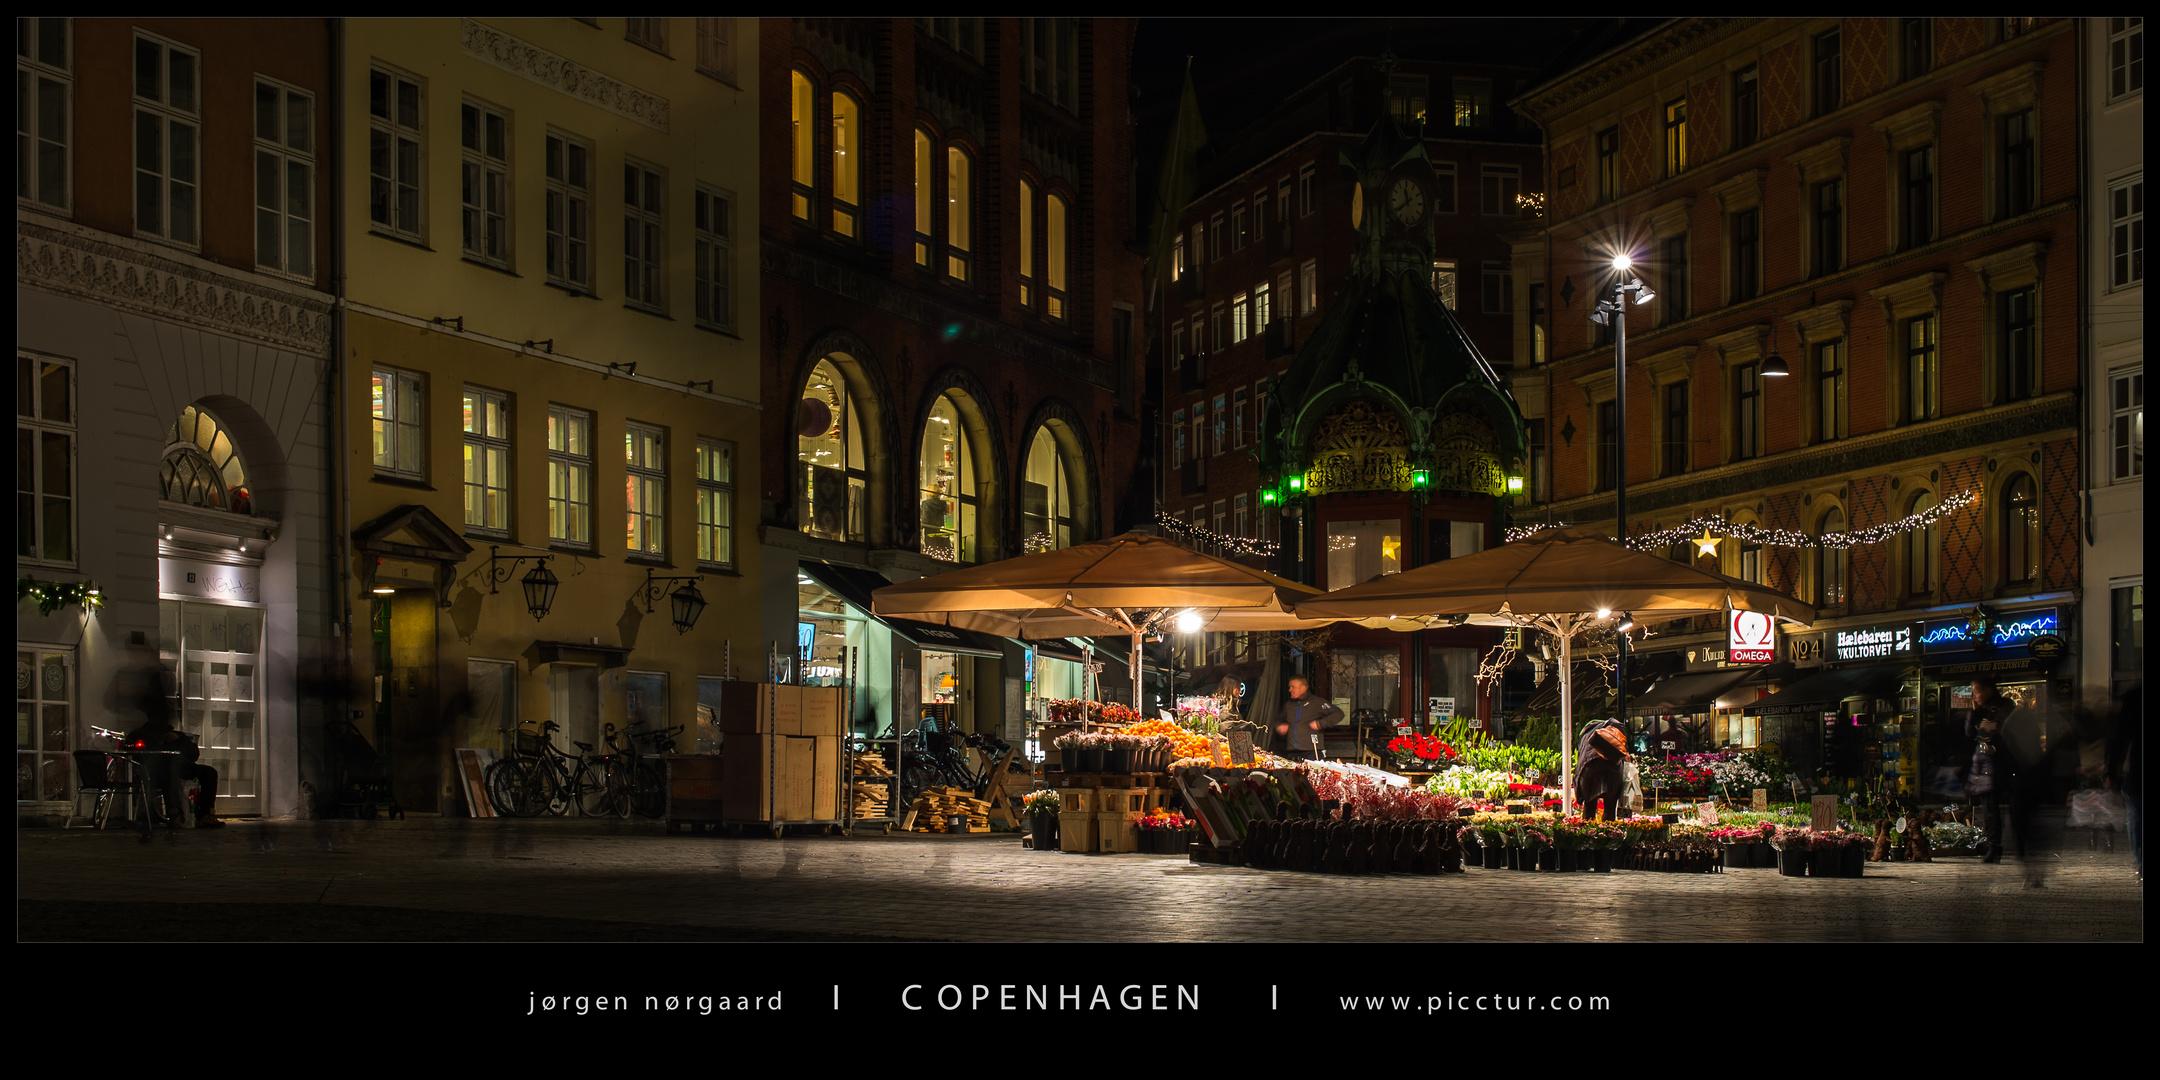 Copenhagen marketplace